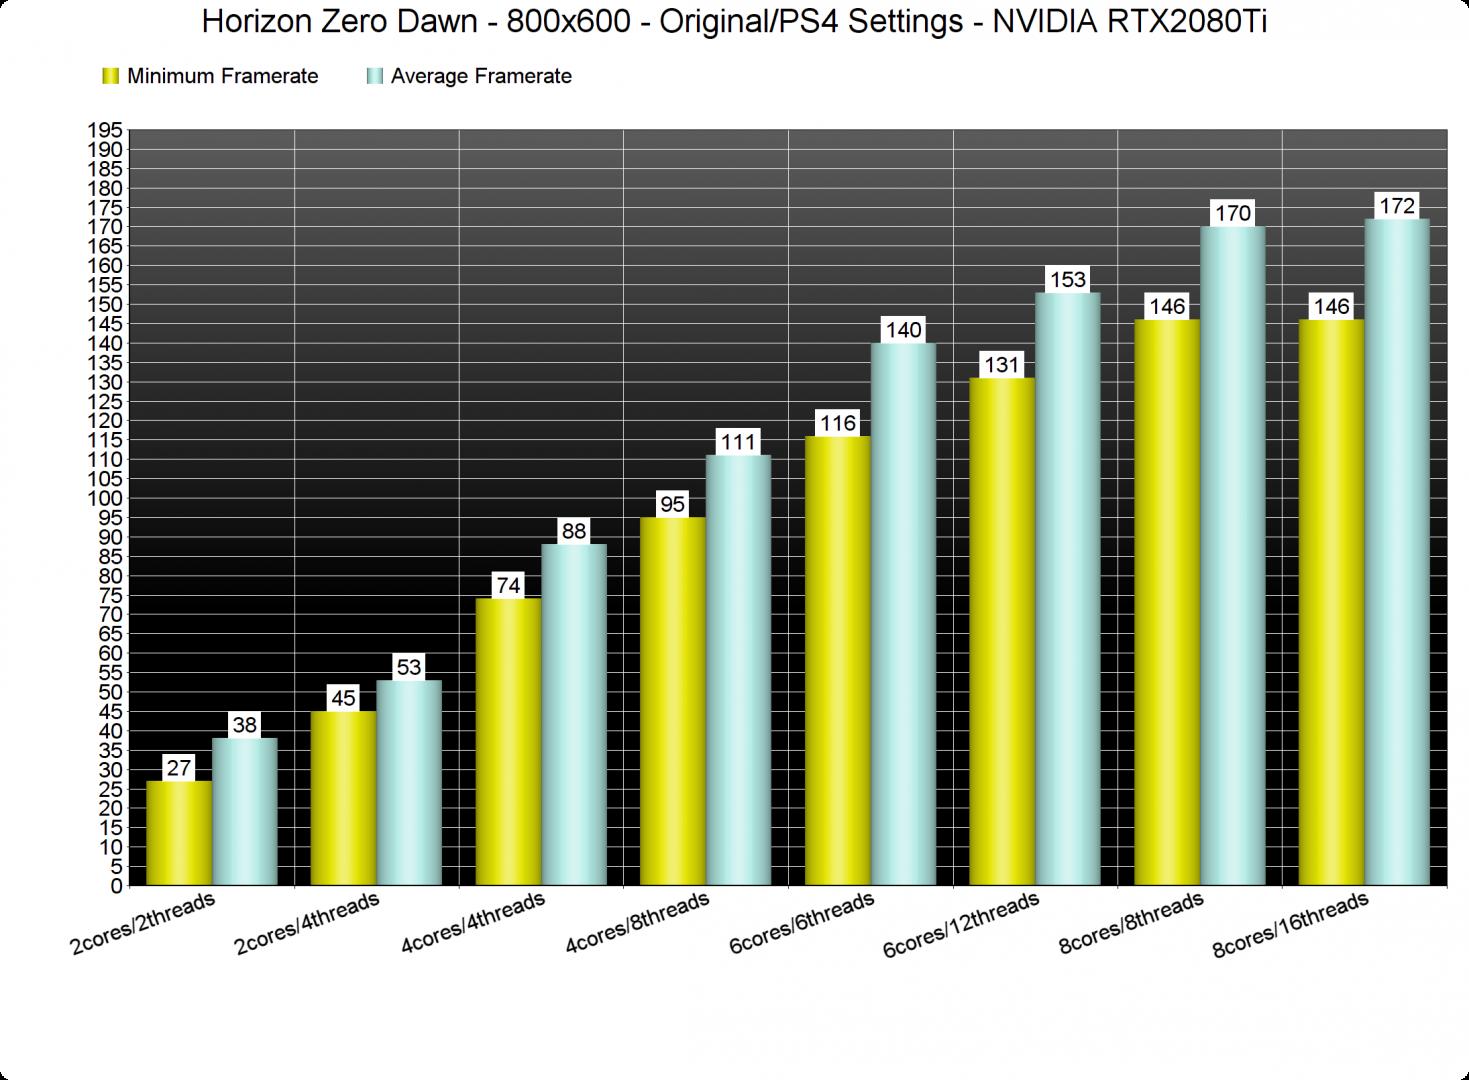 Horizon Zero Dawn CPU benchmarks